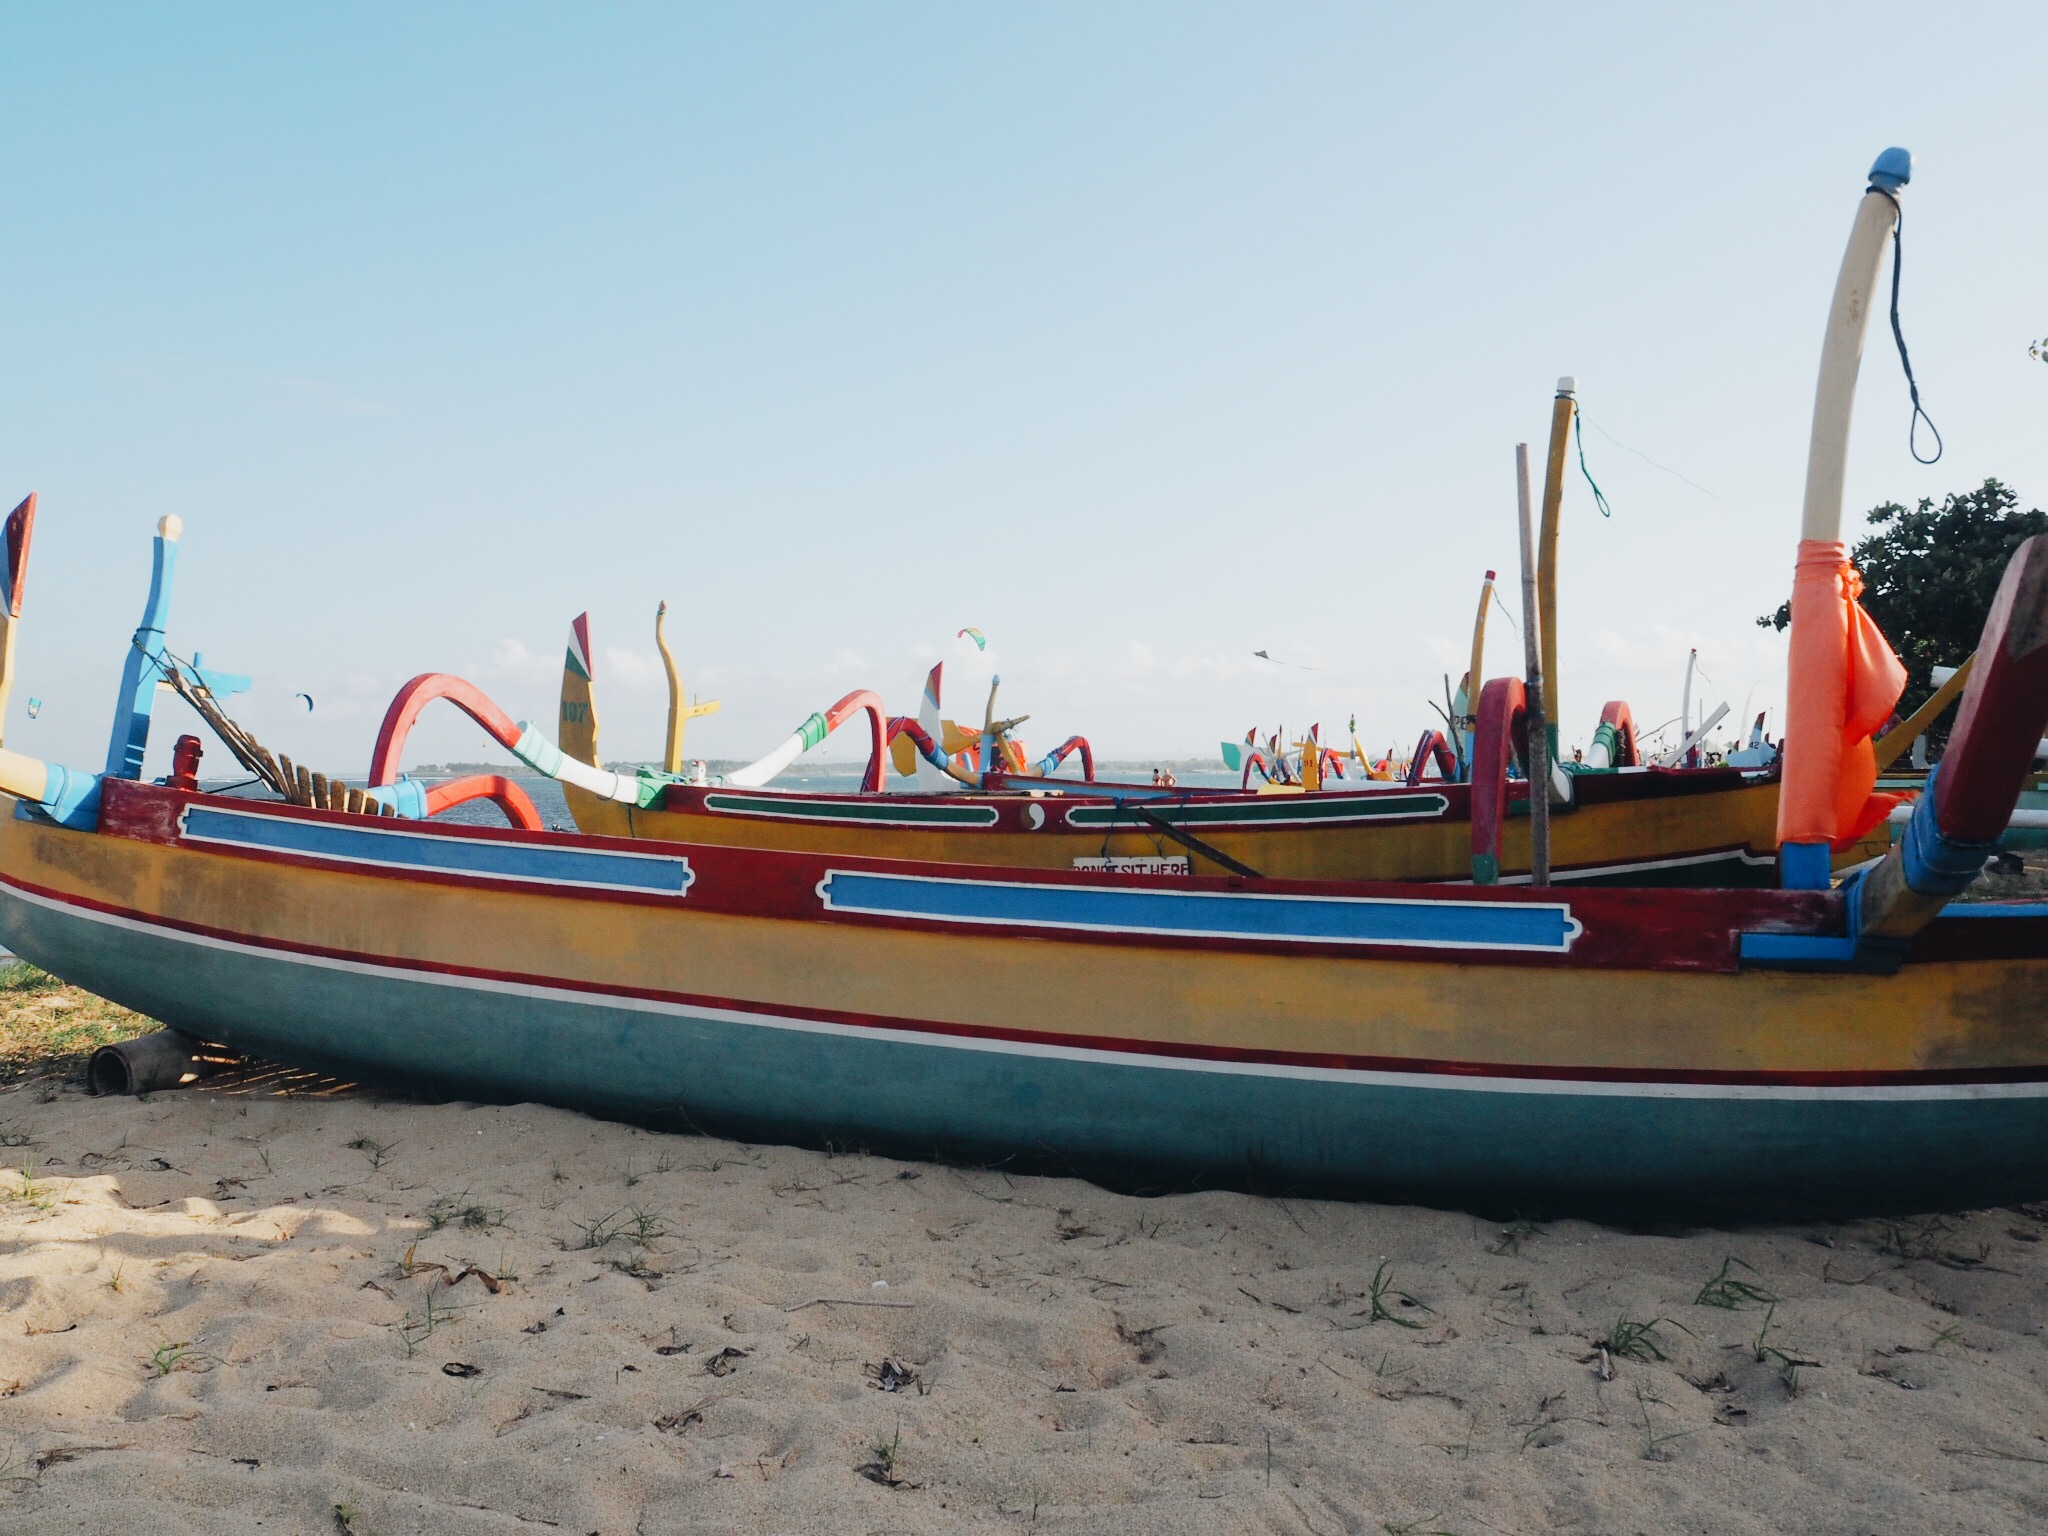 Travel Misadventures: Bali - boats on Sanur Beach